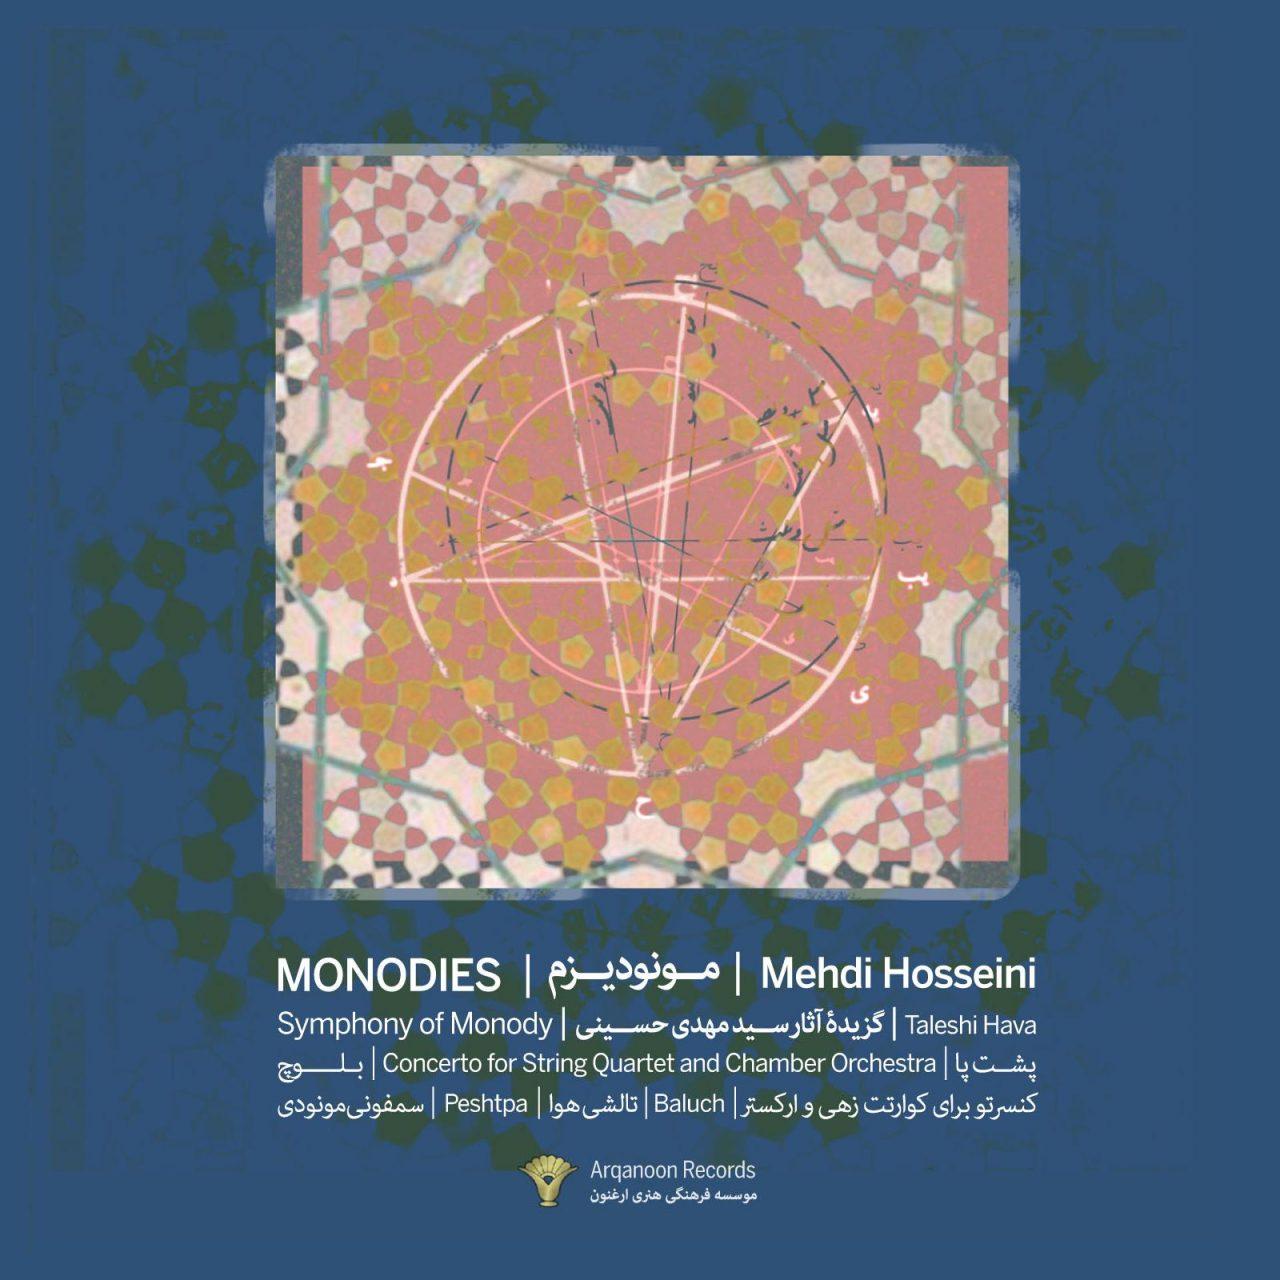 https://www.monodies.com/wp-content/uploads/2019/02/Monodies_Mehdi-Hosseini__1600x1600-1280x1280.jpg